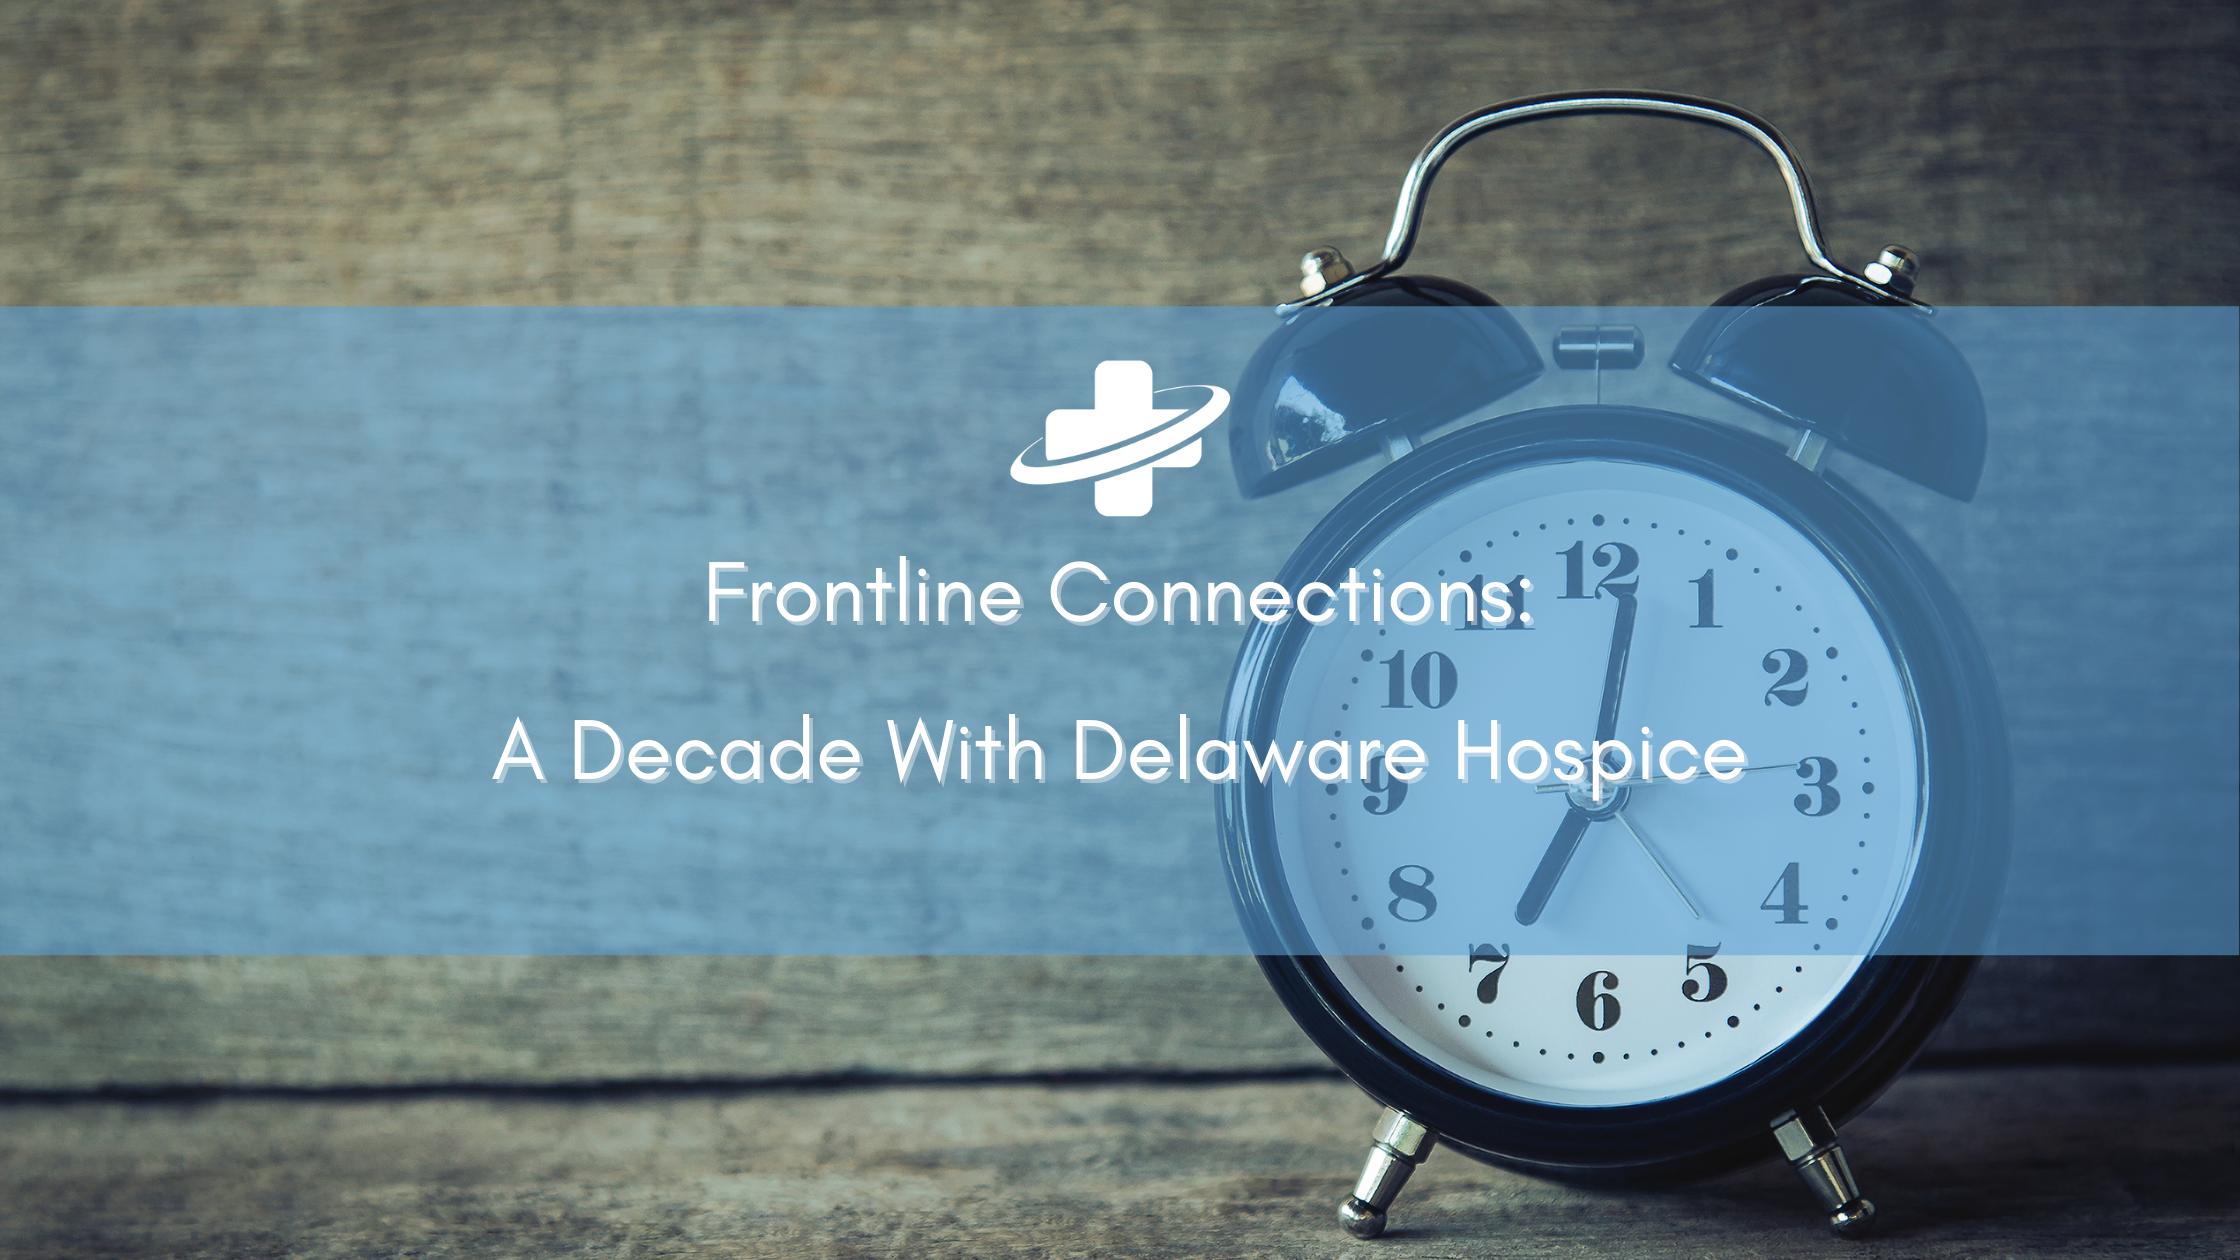 Delaware Hospice